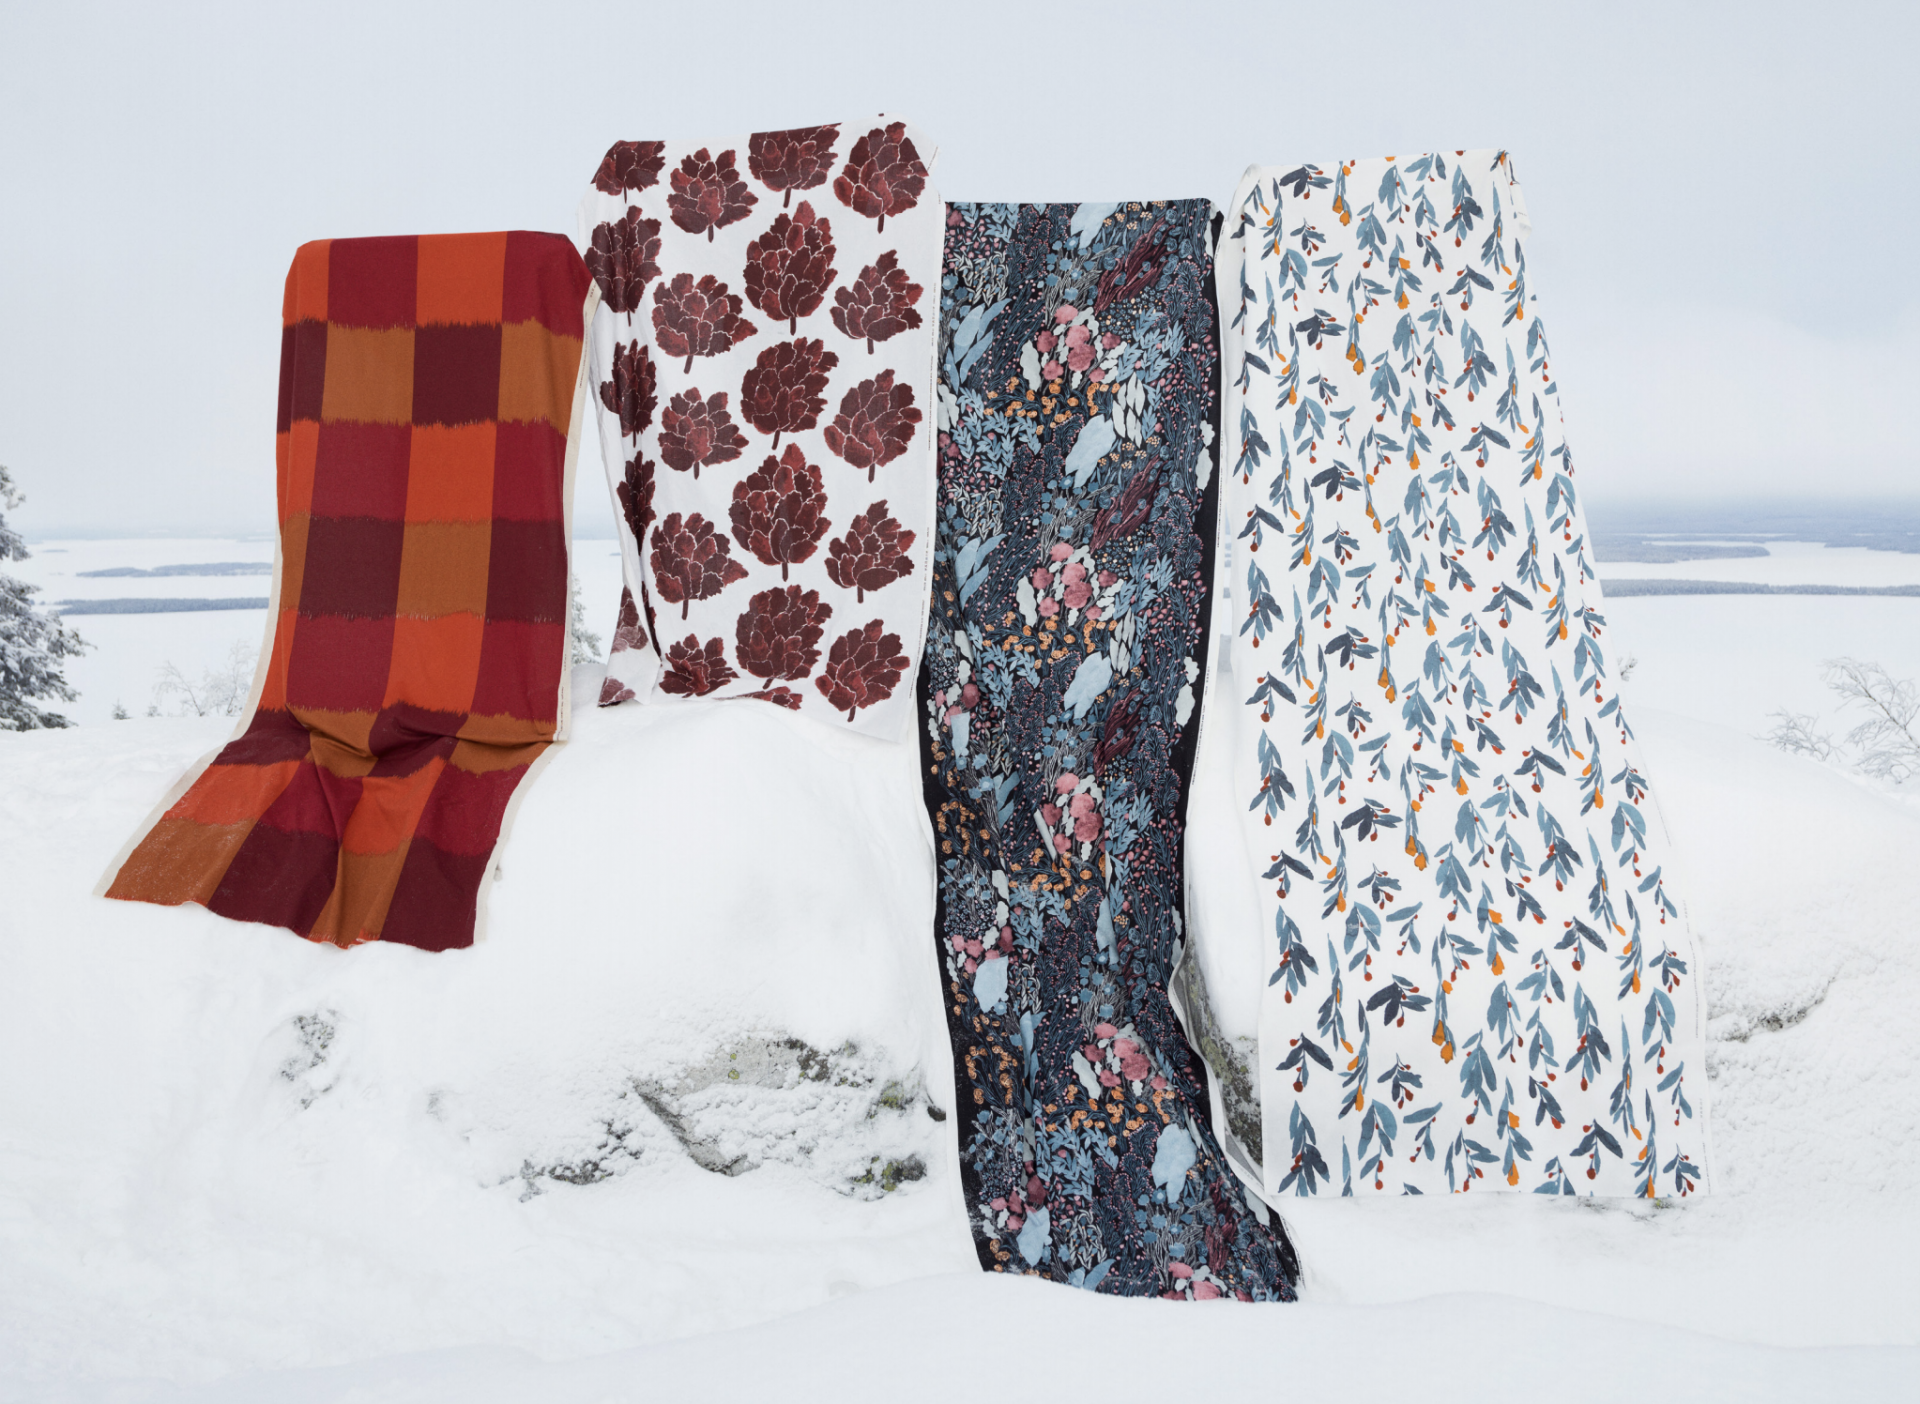 Marimekko winter 2020 for Marimekko by Susanna Vento